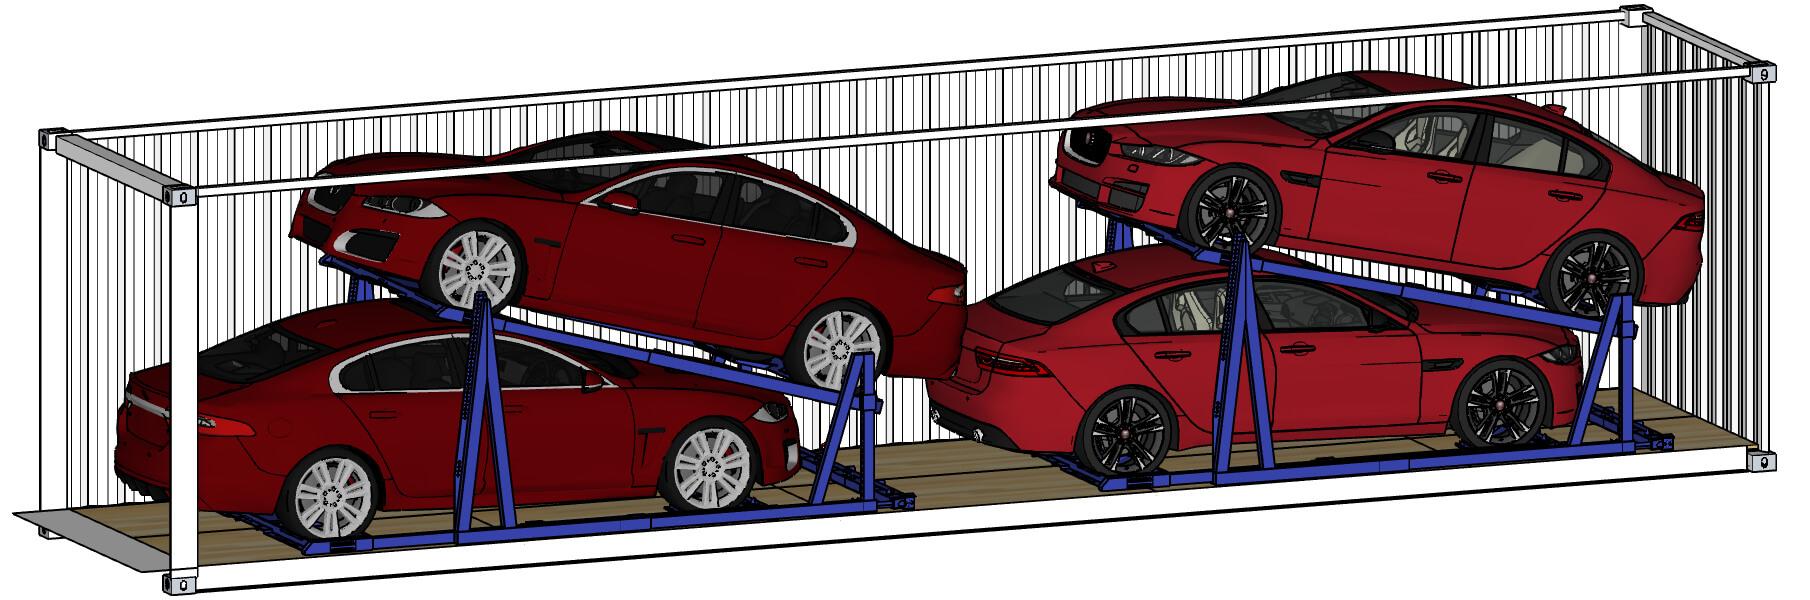 El Rak Vehicle Racking Systems Car Storage Solutions Trans Rak